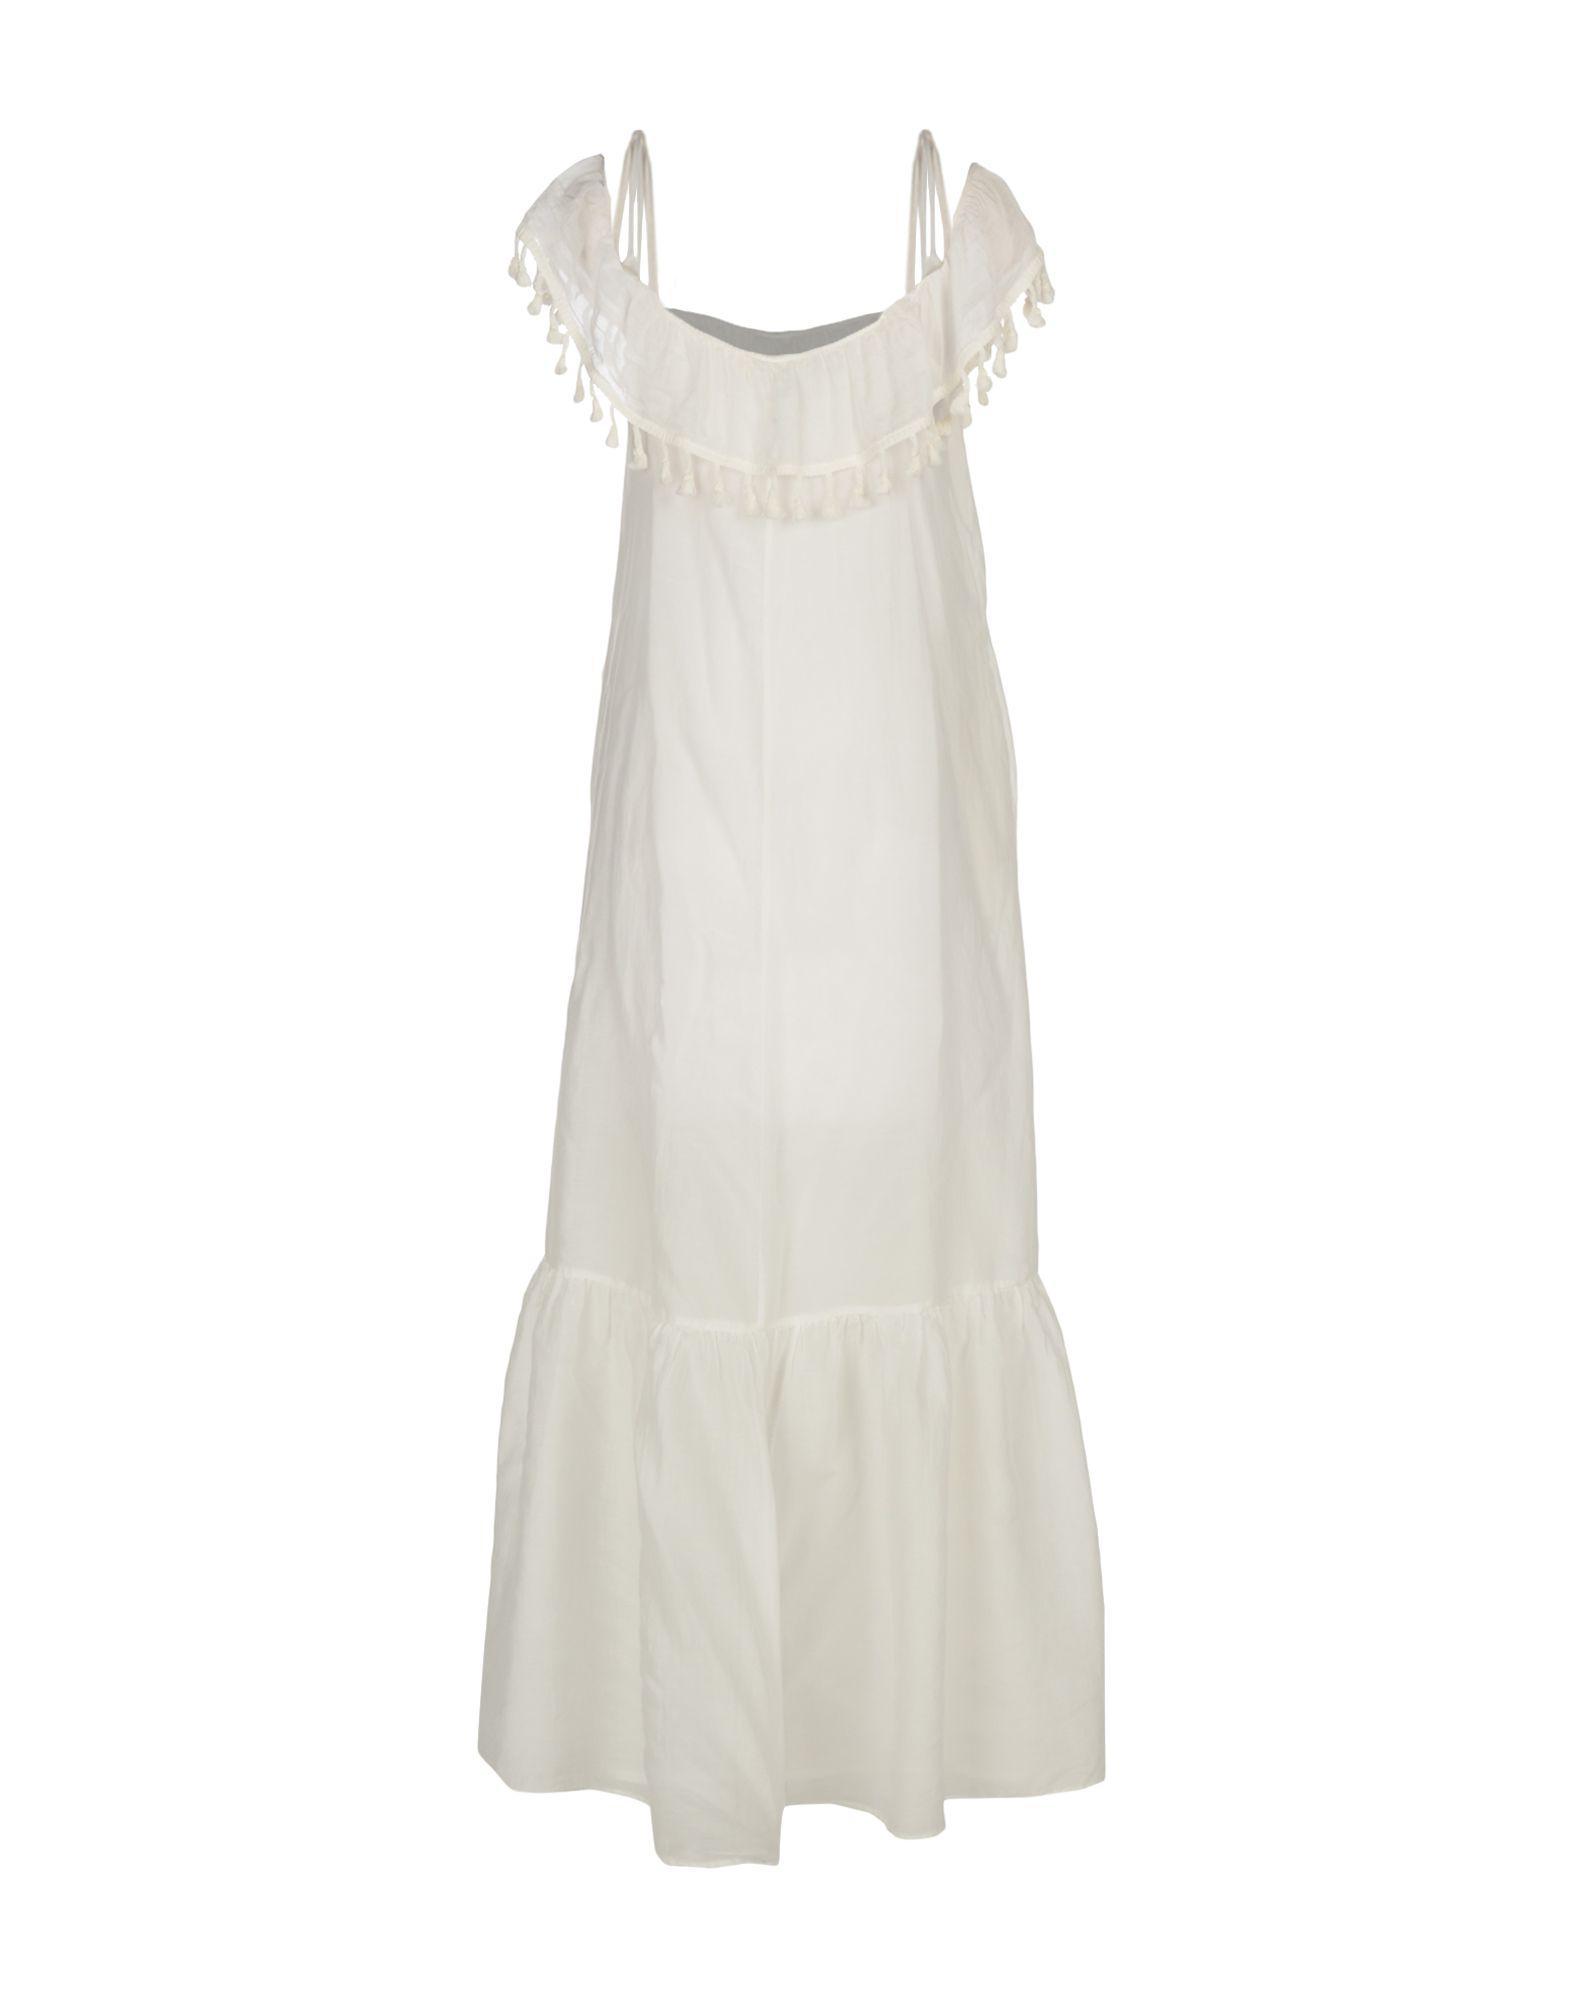 Suoli Long Dress in White